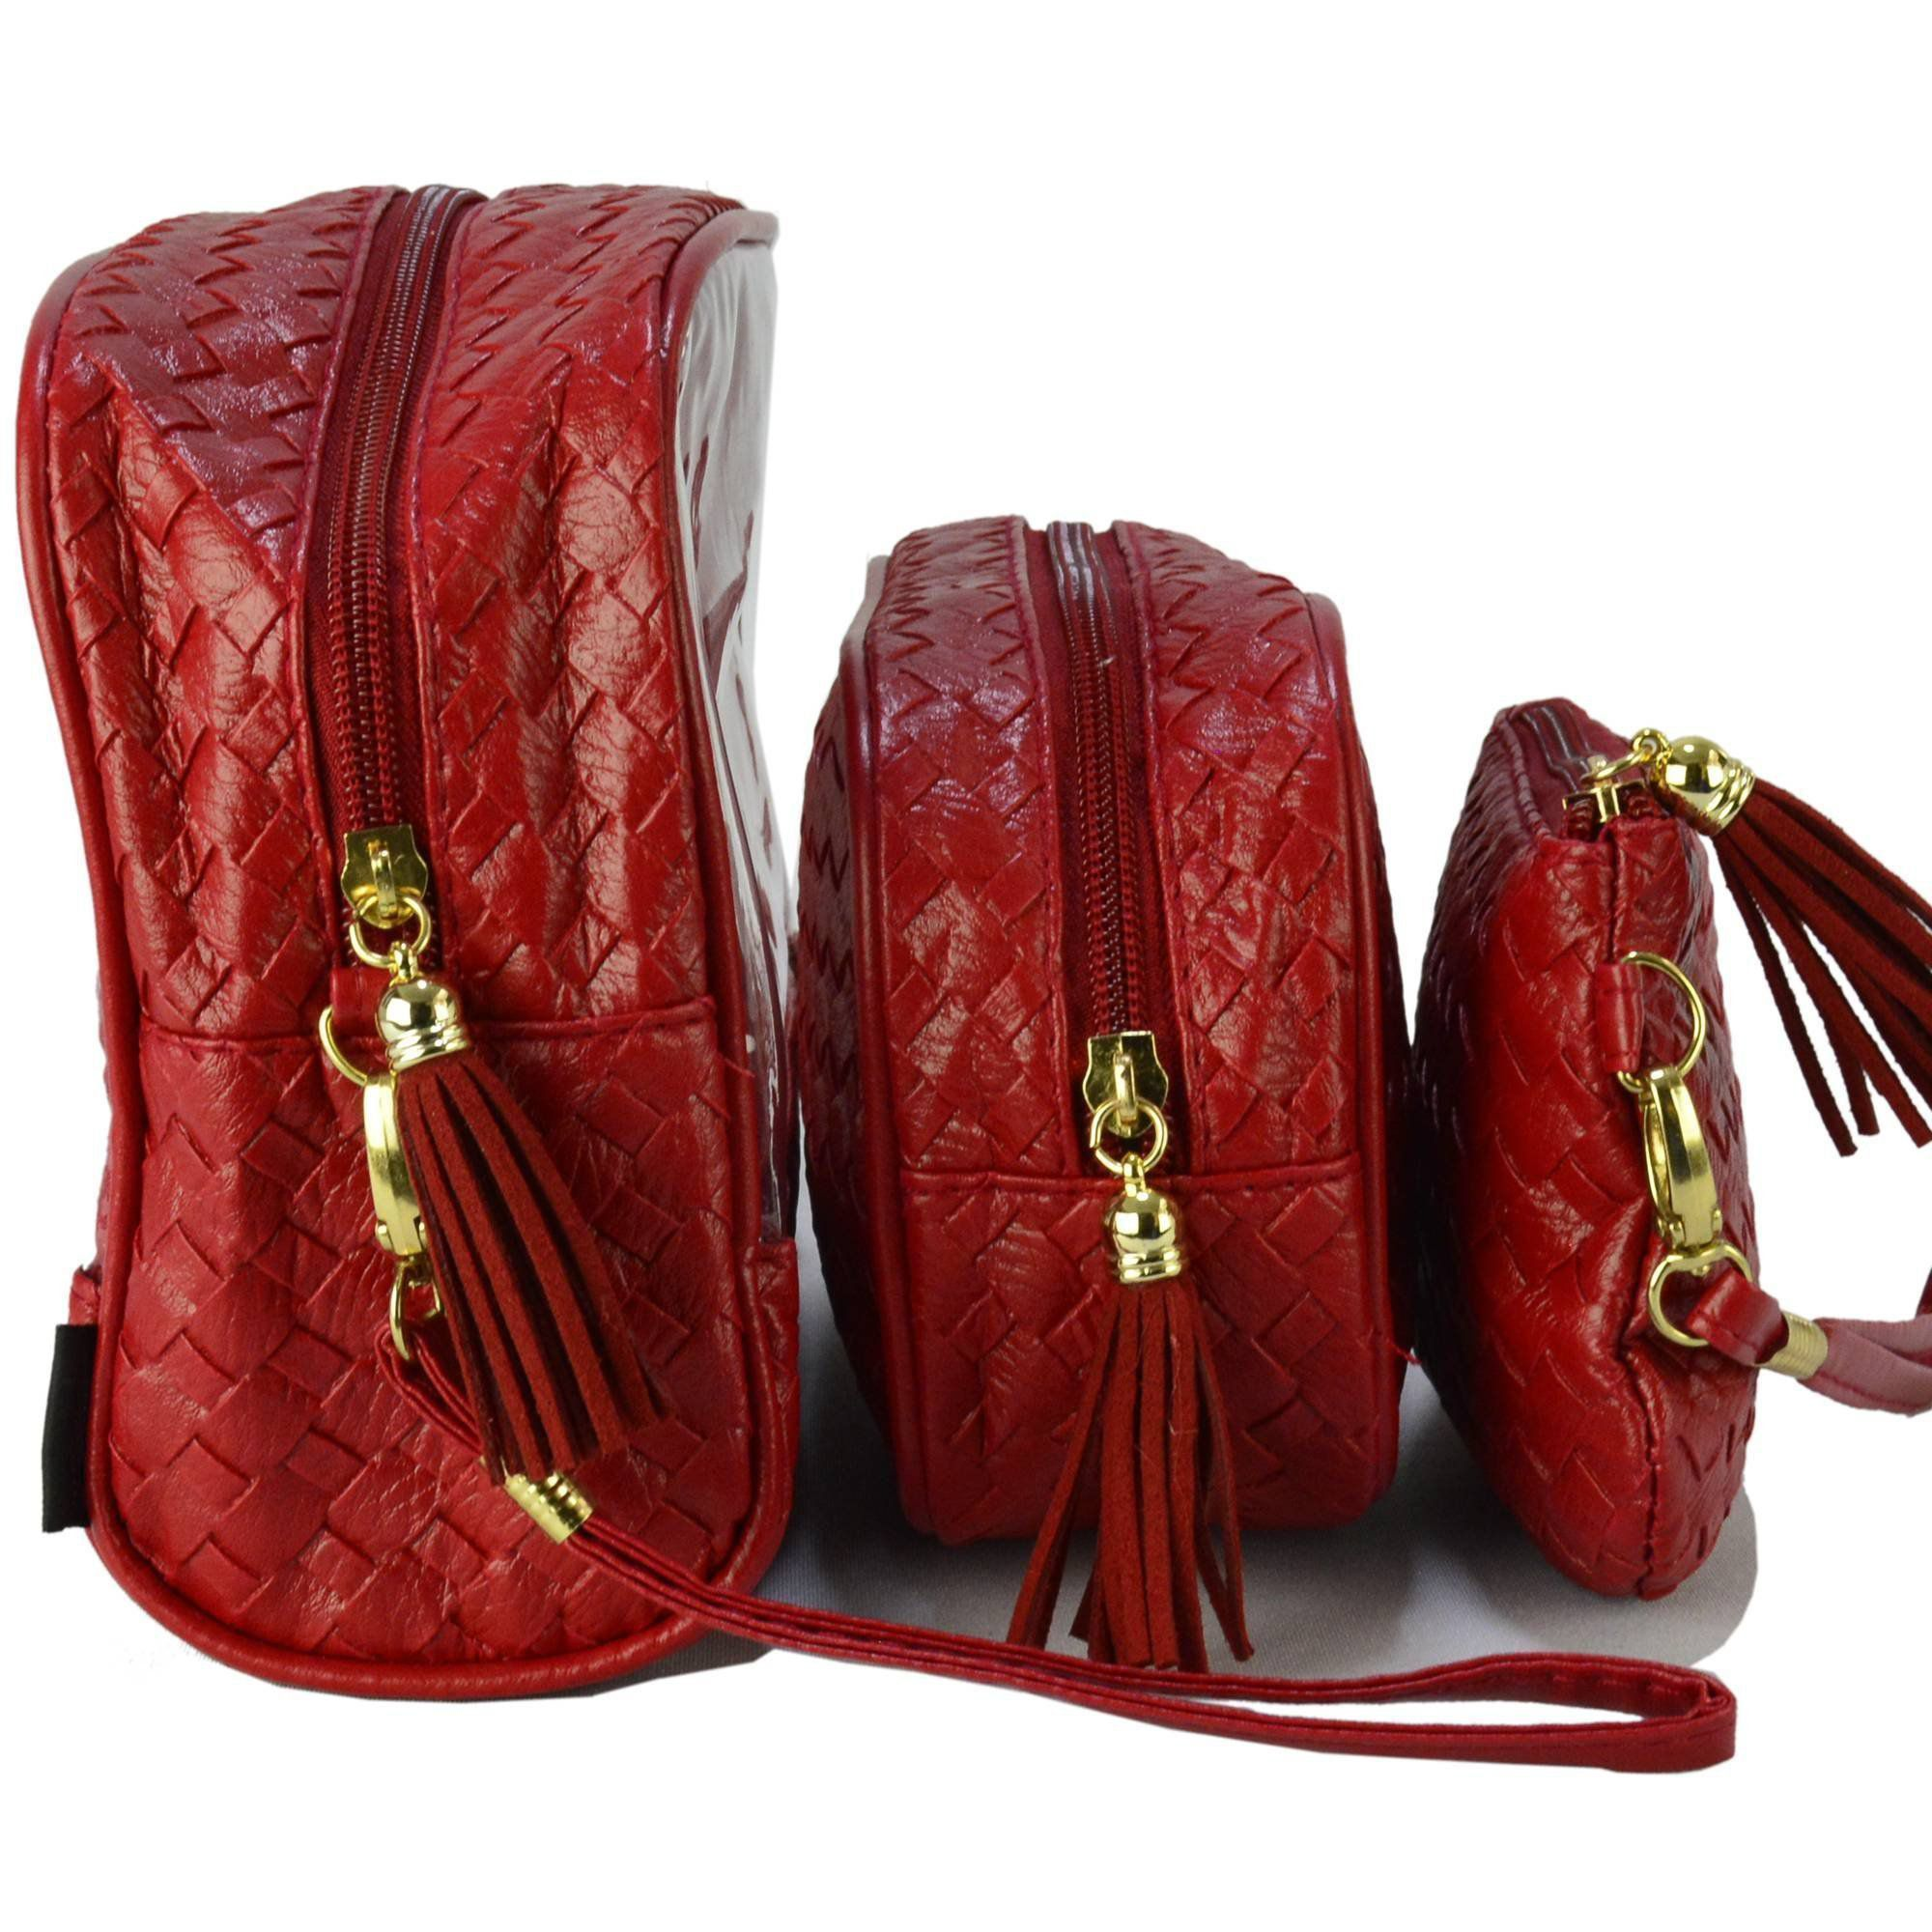 Frasqueiras Necessaire Feminina Luxo Vermelho Kit 3 Peças CBRN08315